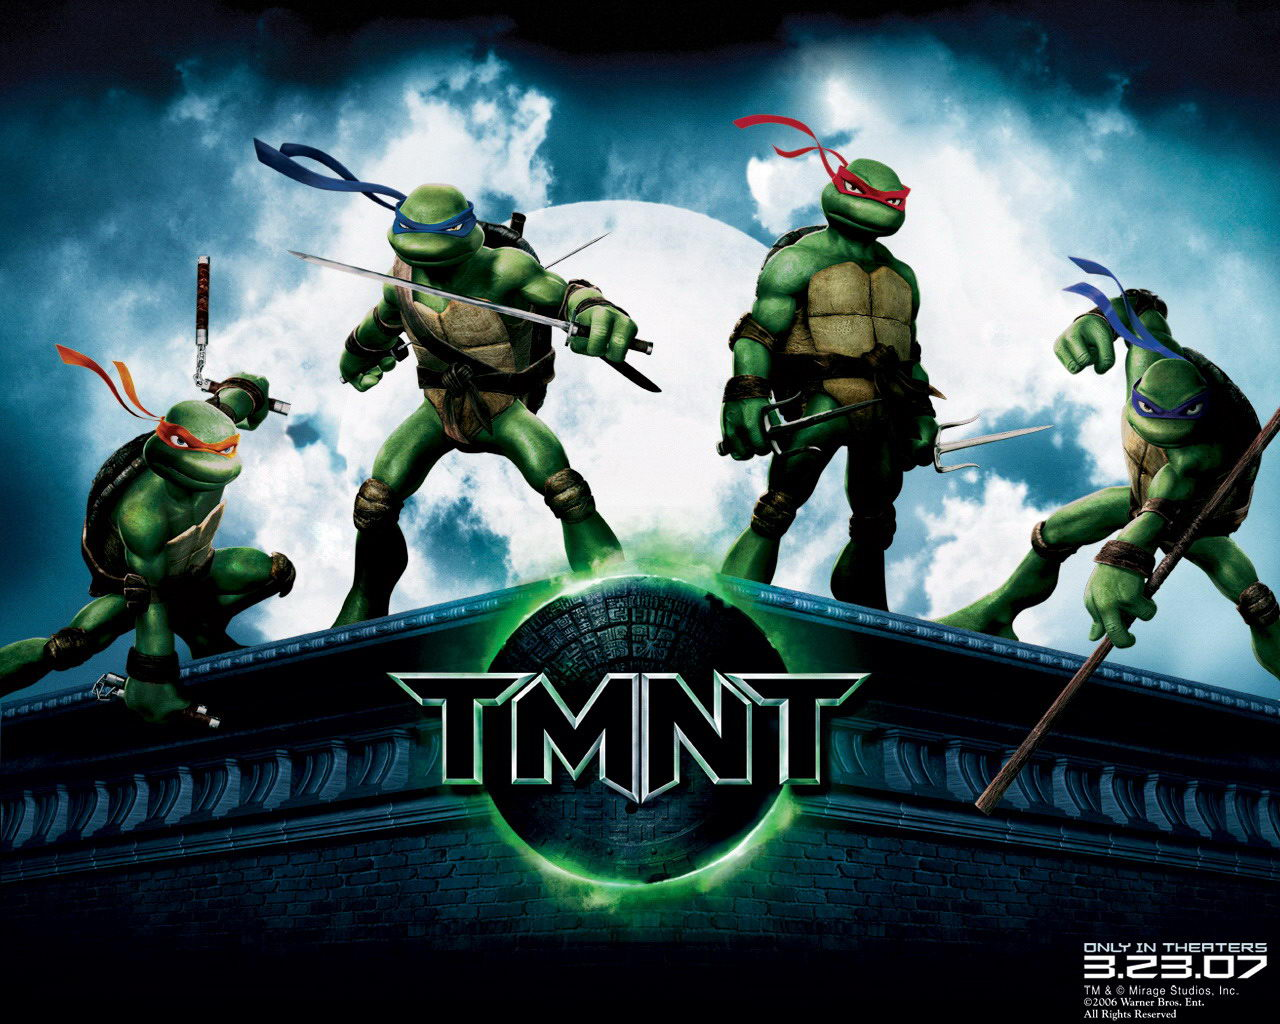 Free Download Wallpaper Blog Ninja Turtles Hd 1280x1024 For Your Desktop Mobile Tablet Explore 70 Ninja Turtles Wallpaper Teenage Mutant Ninja Turtles Wallpaper Tmnt Wallpaper Turtle Wallpaper